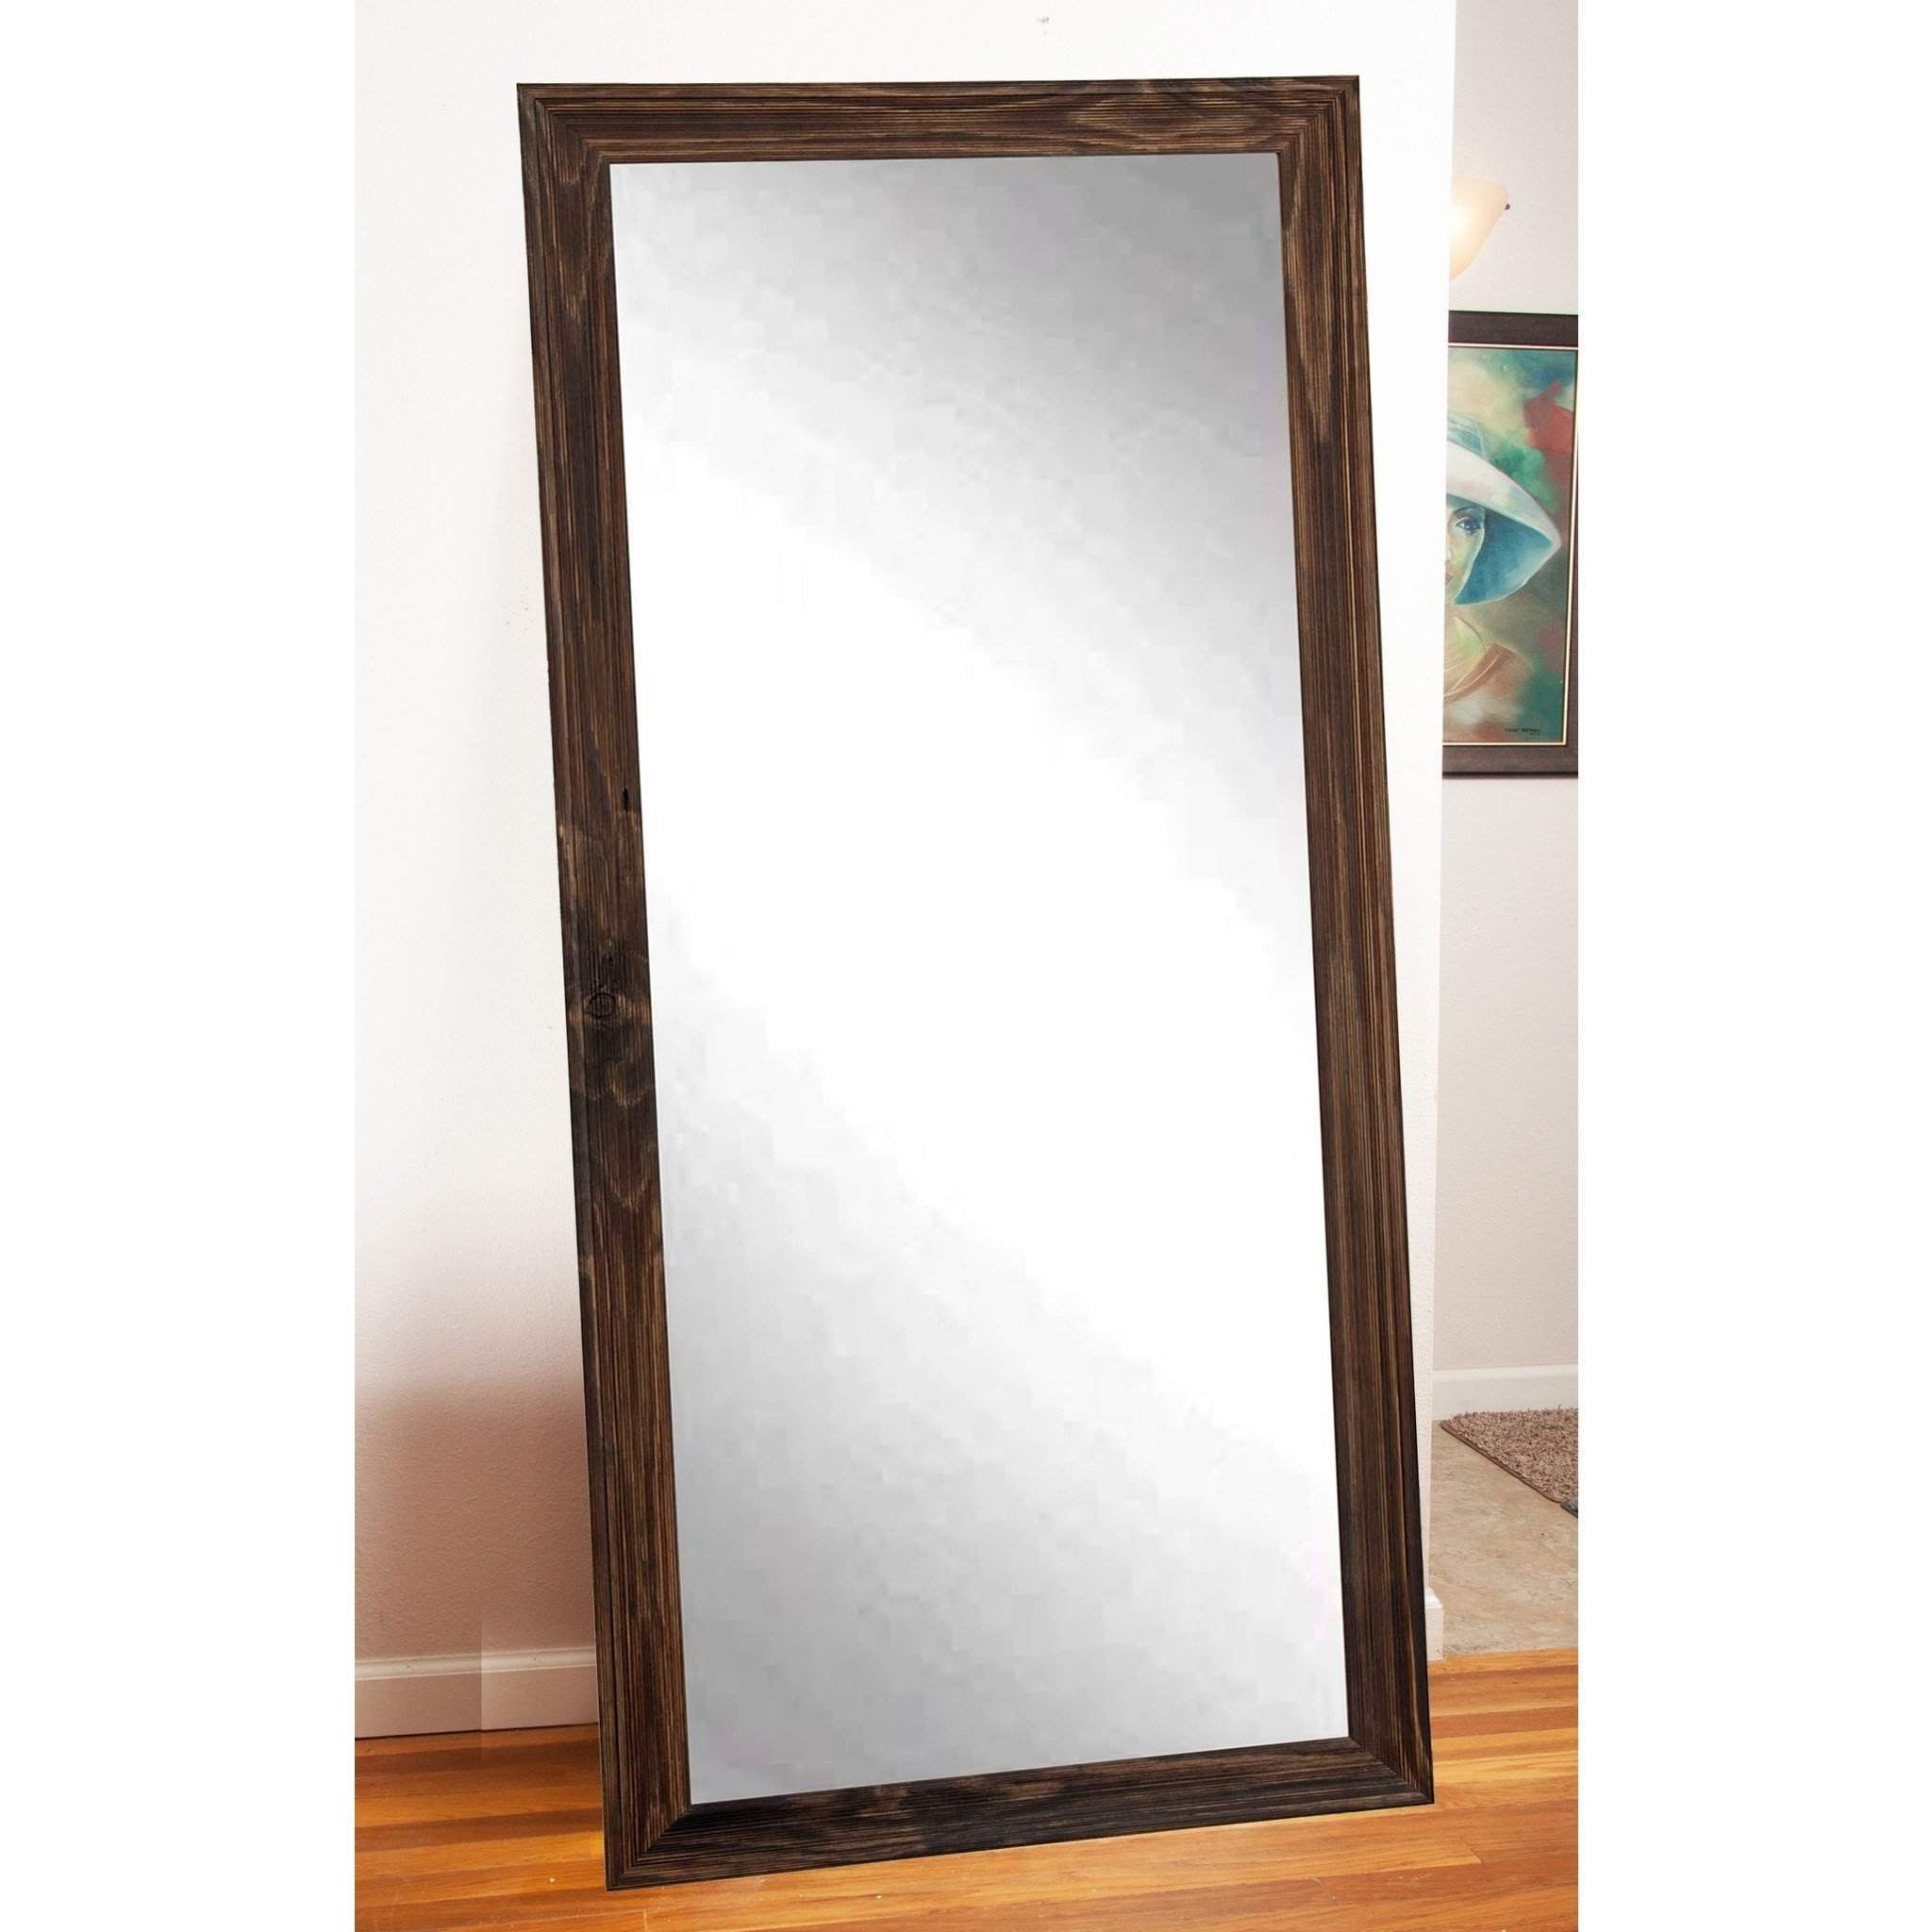 45 Best Choice Products Cheval Floor Mirror Bedroom Home Furniture Walmart Com Floor Mirror Decor Floor Mirror Dressing Mirror Designs